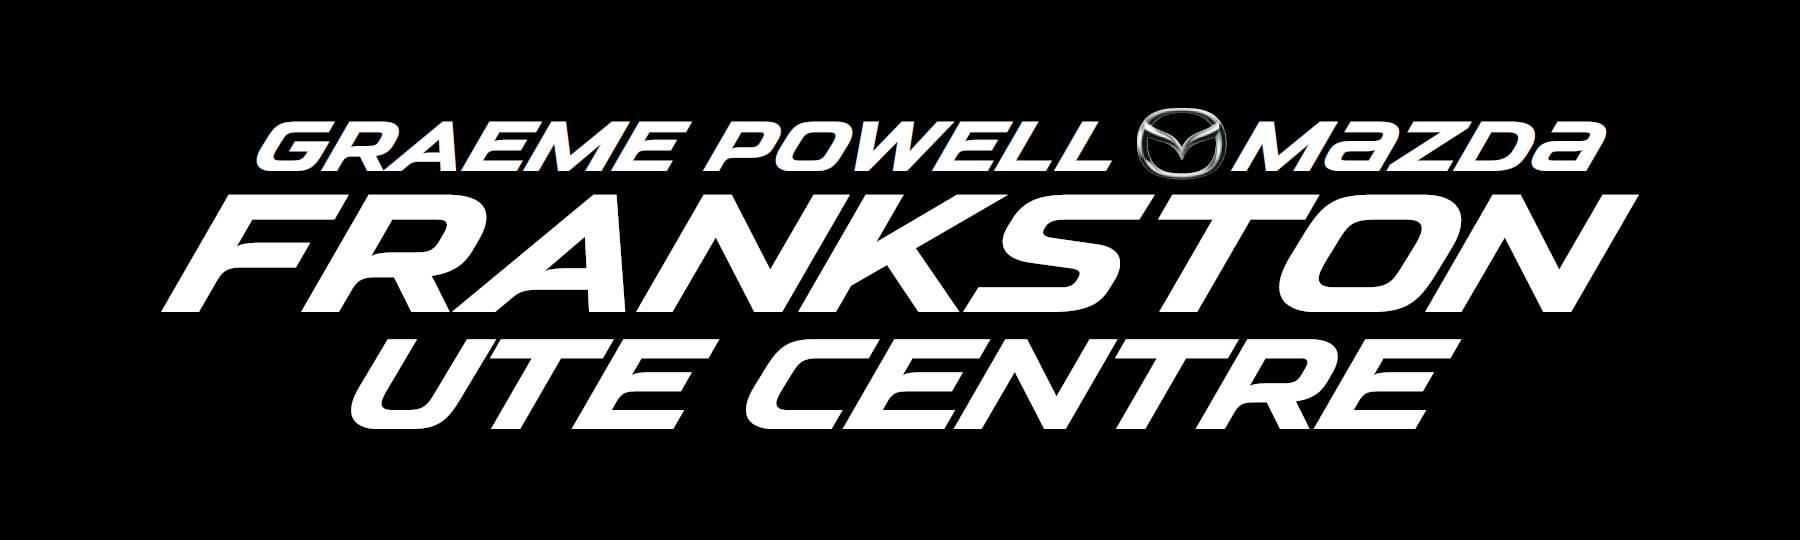 Graeme Powell Mazda BT-50 Ute Centre